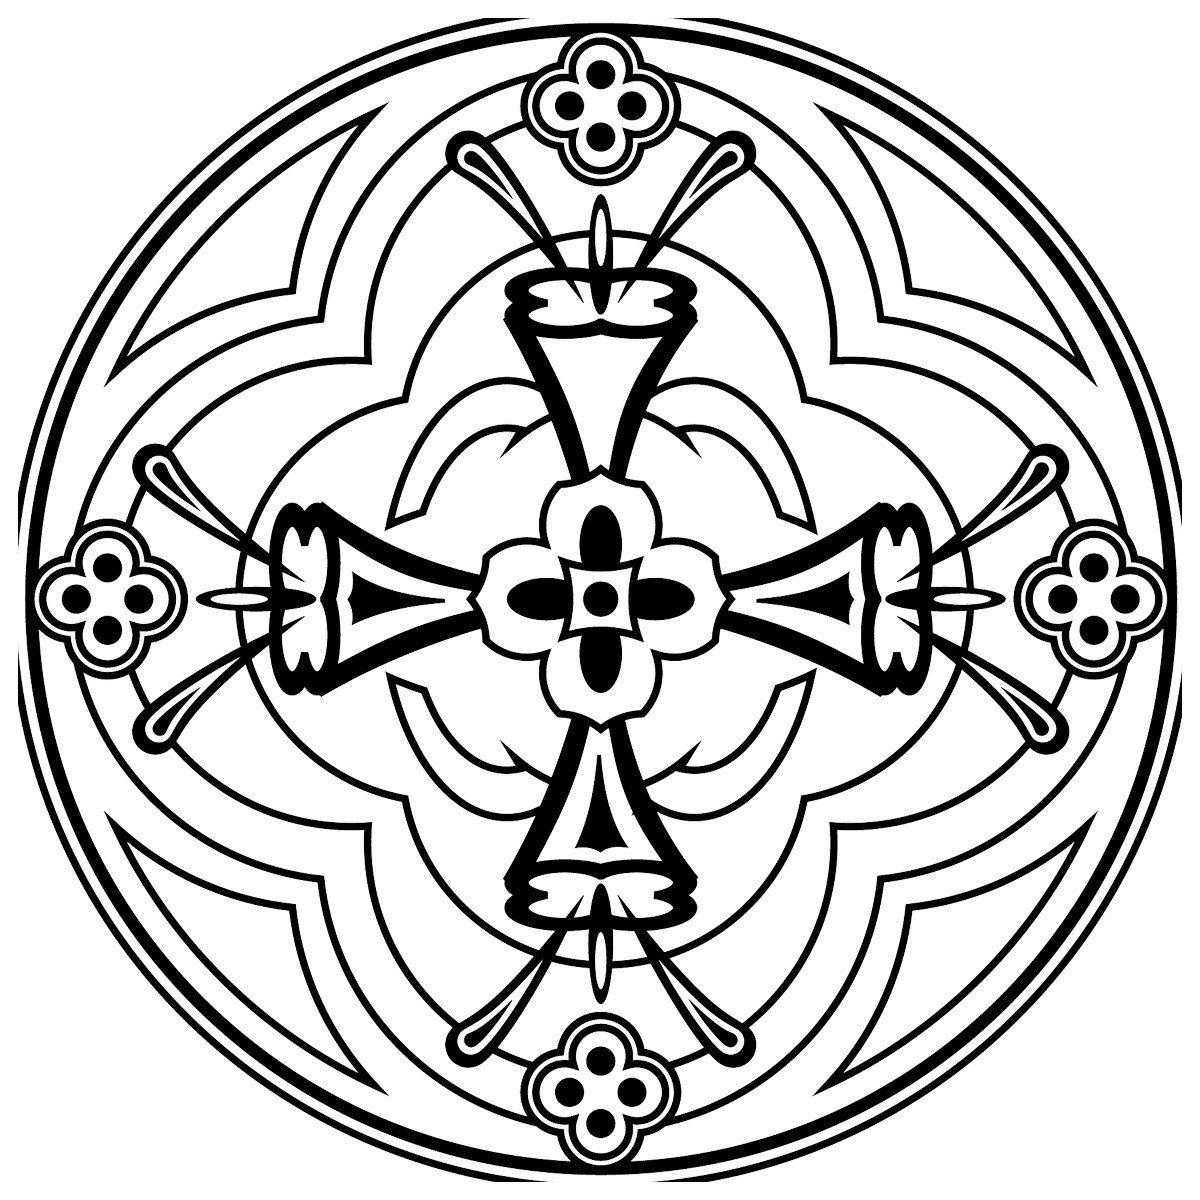 Зендала Праздничная - Картинка для раскрашивания красками-гуашью